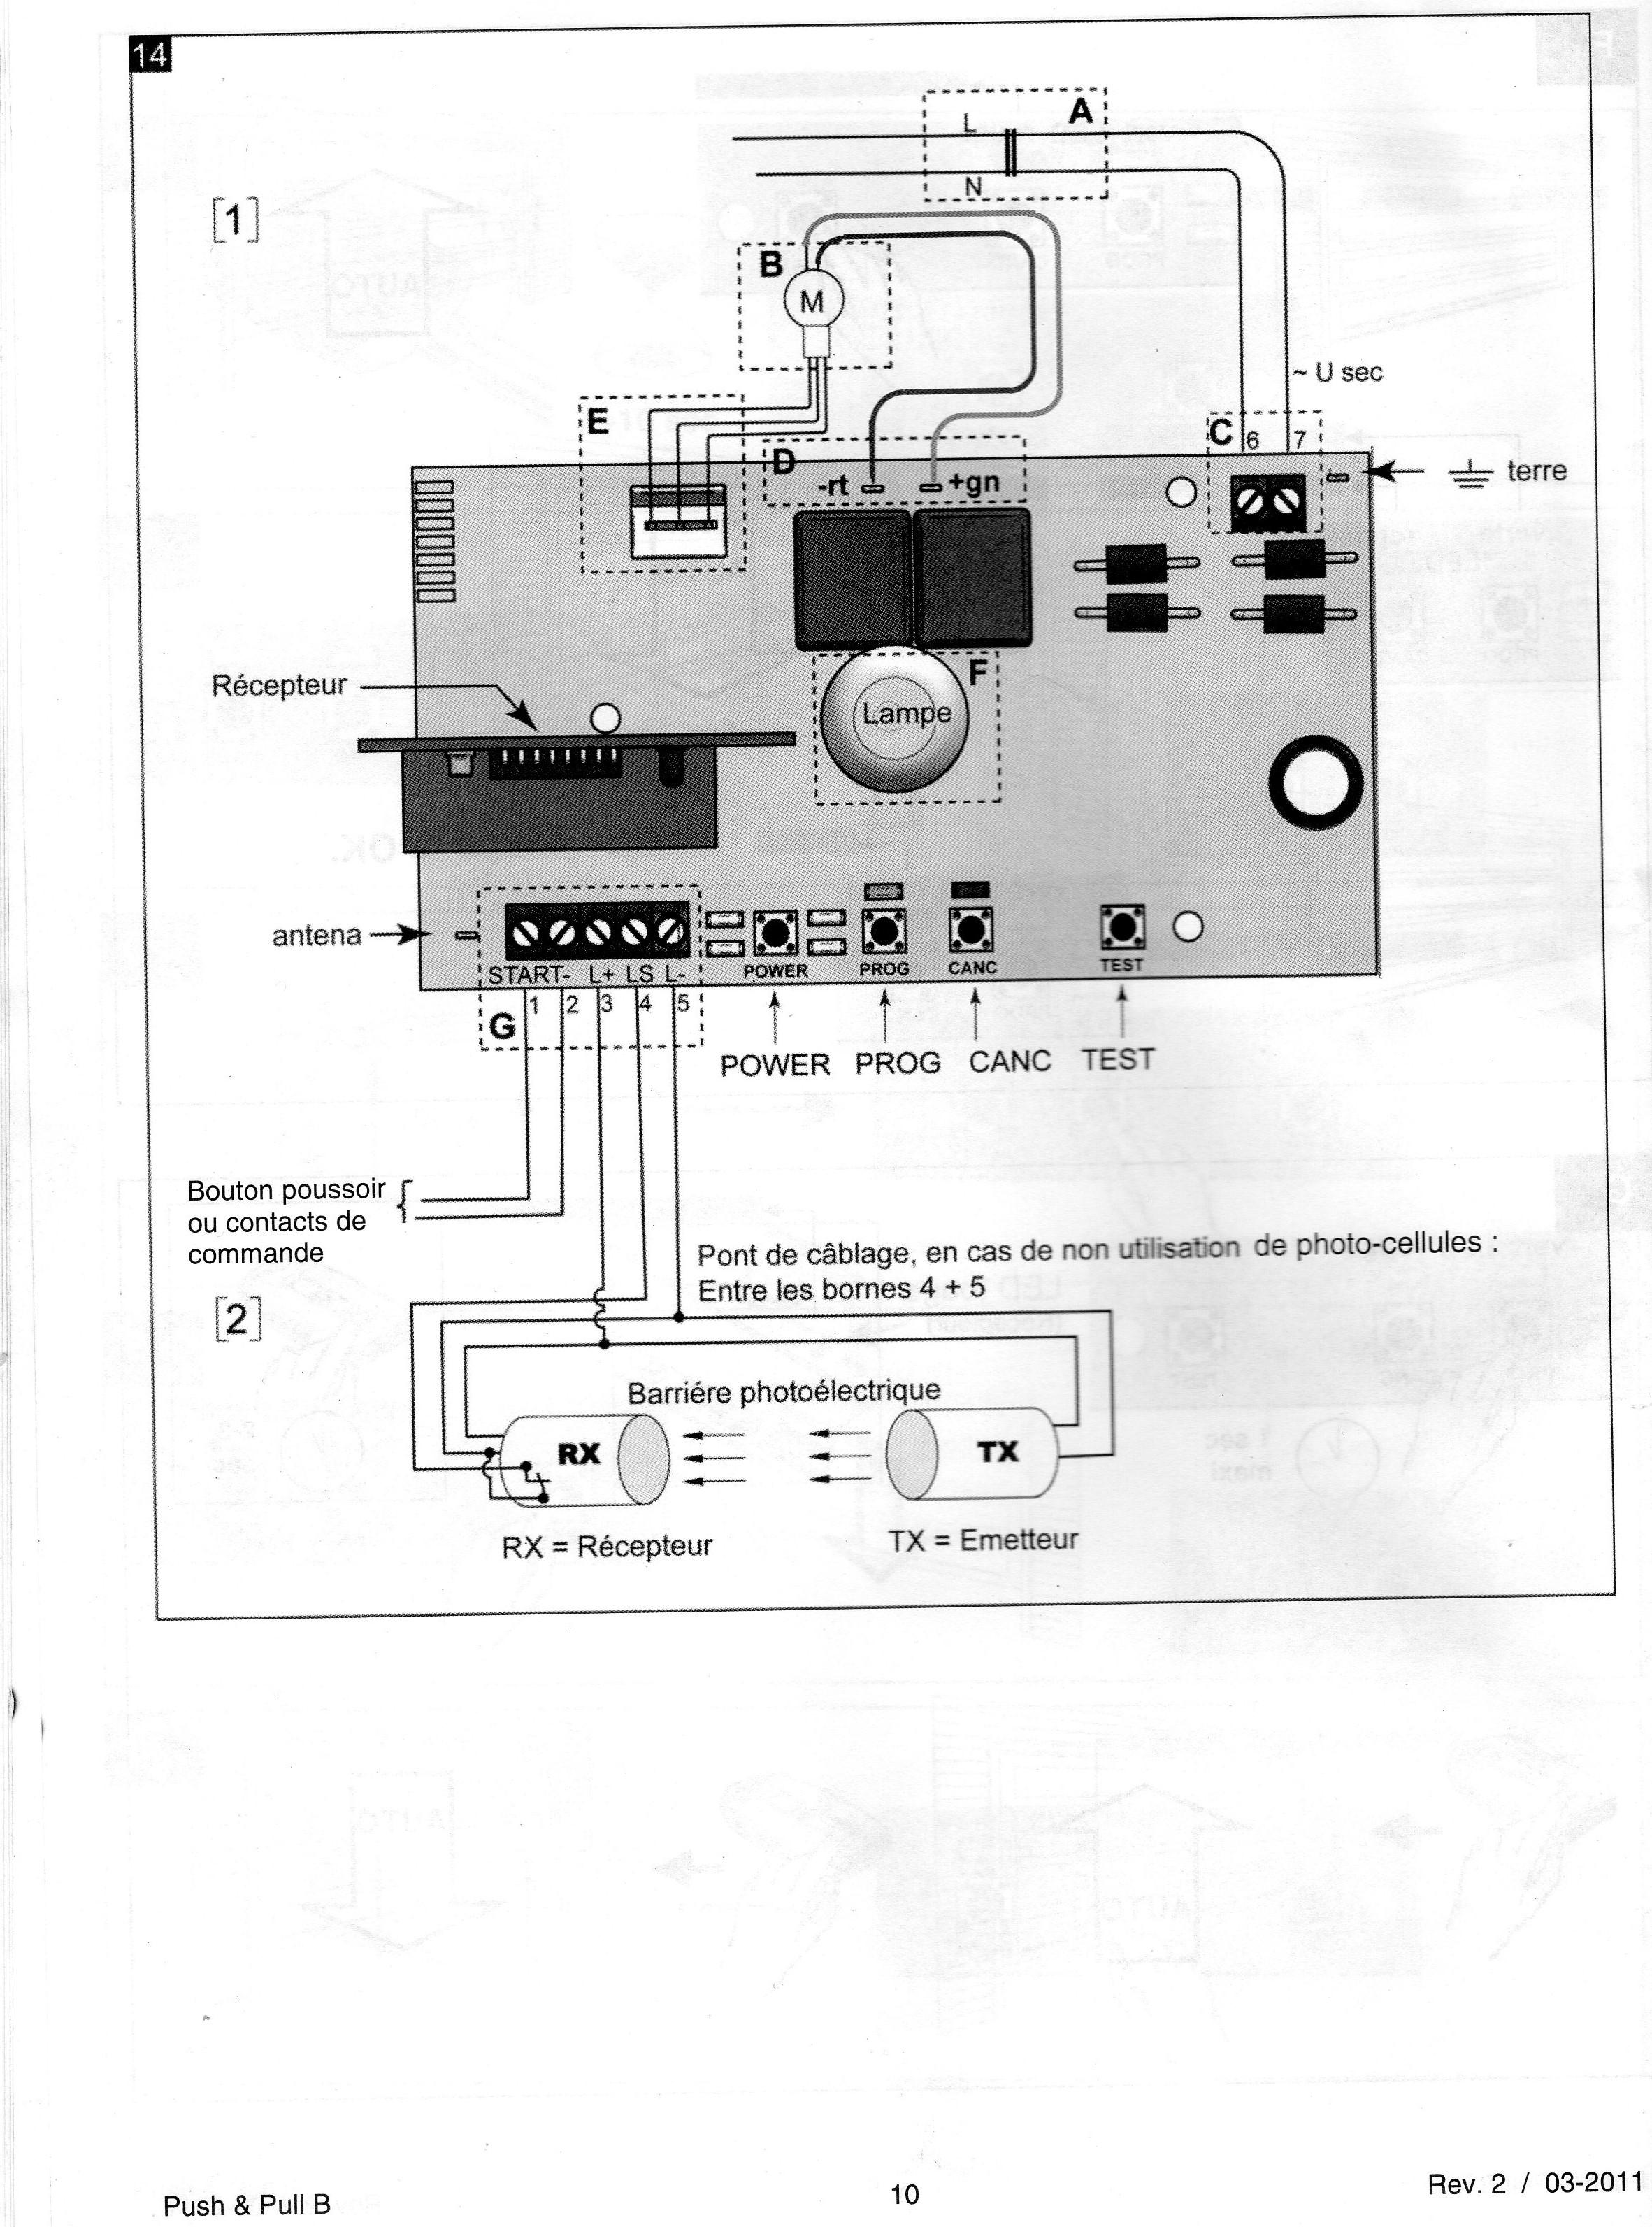 Installation radio recepteur et porte de garage r solue for Branchement porte garage electrique